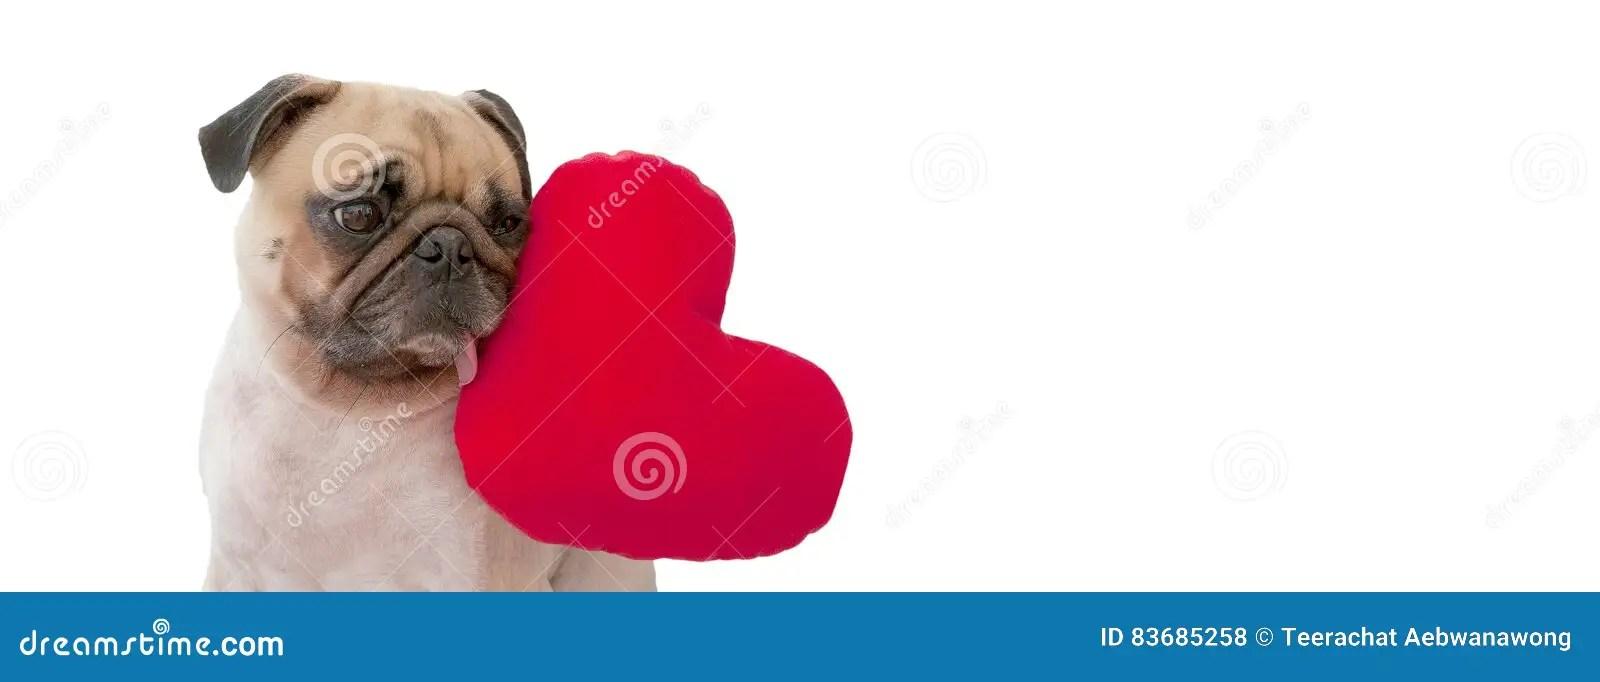 Couple Dog With Heart Stock Photography CartoonDealer